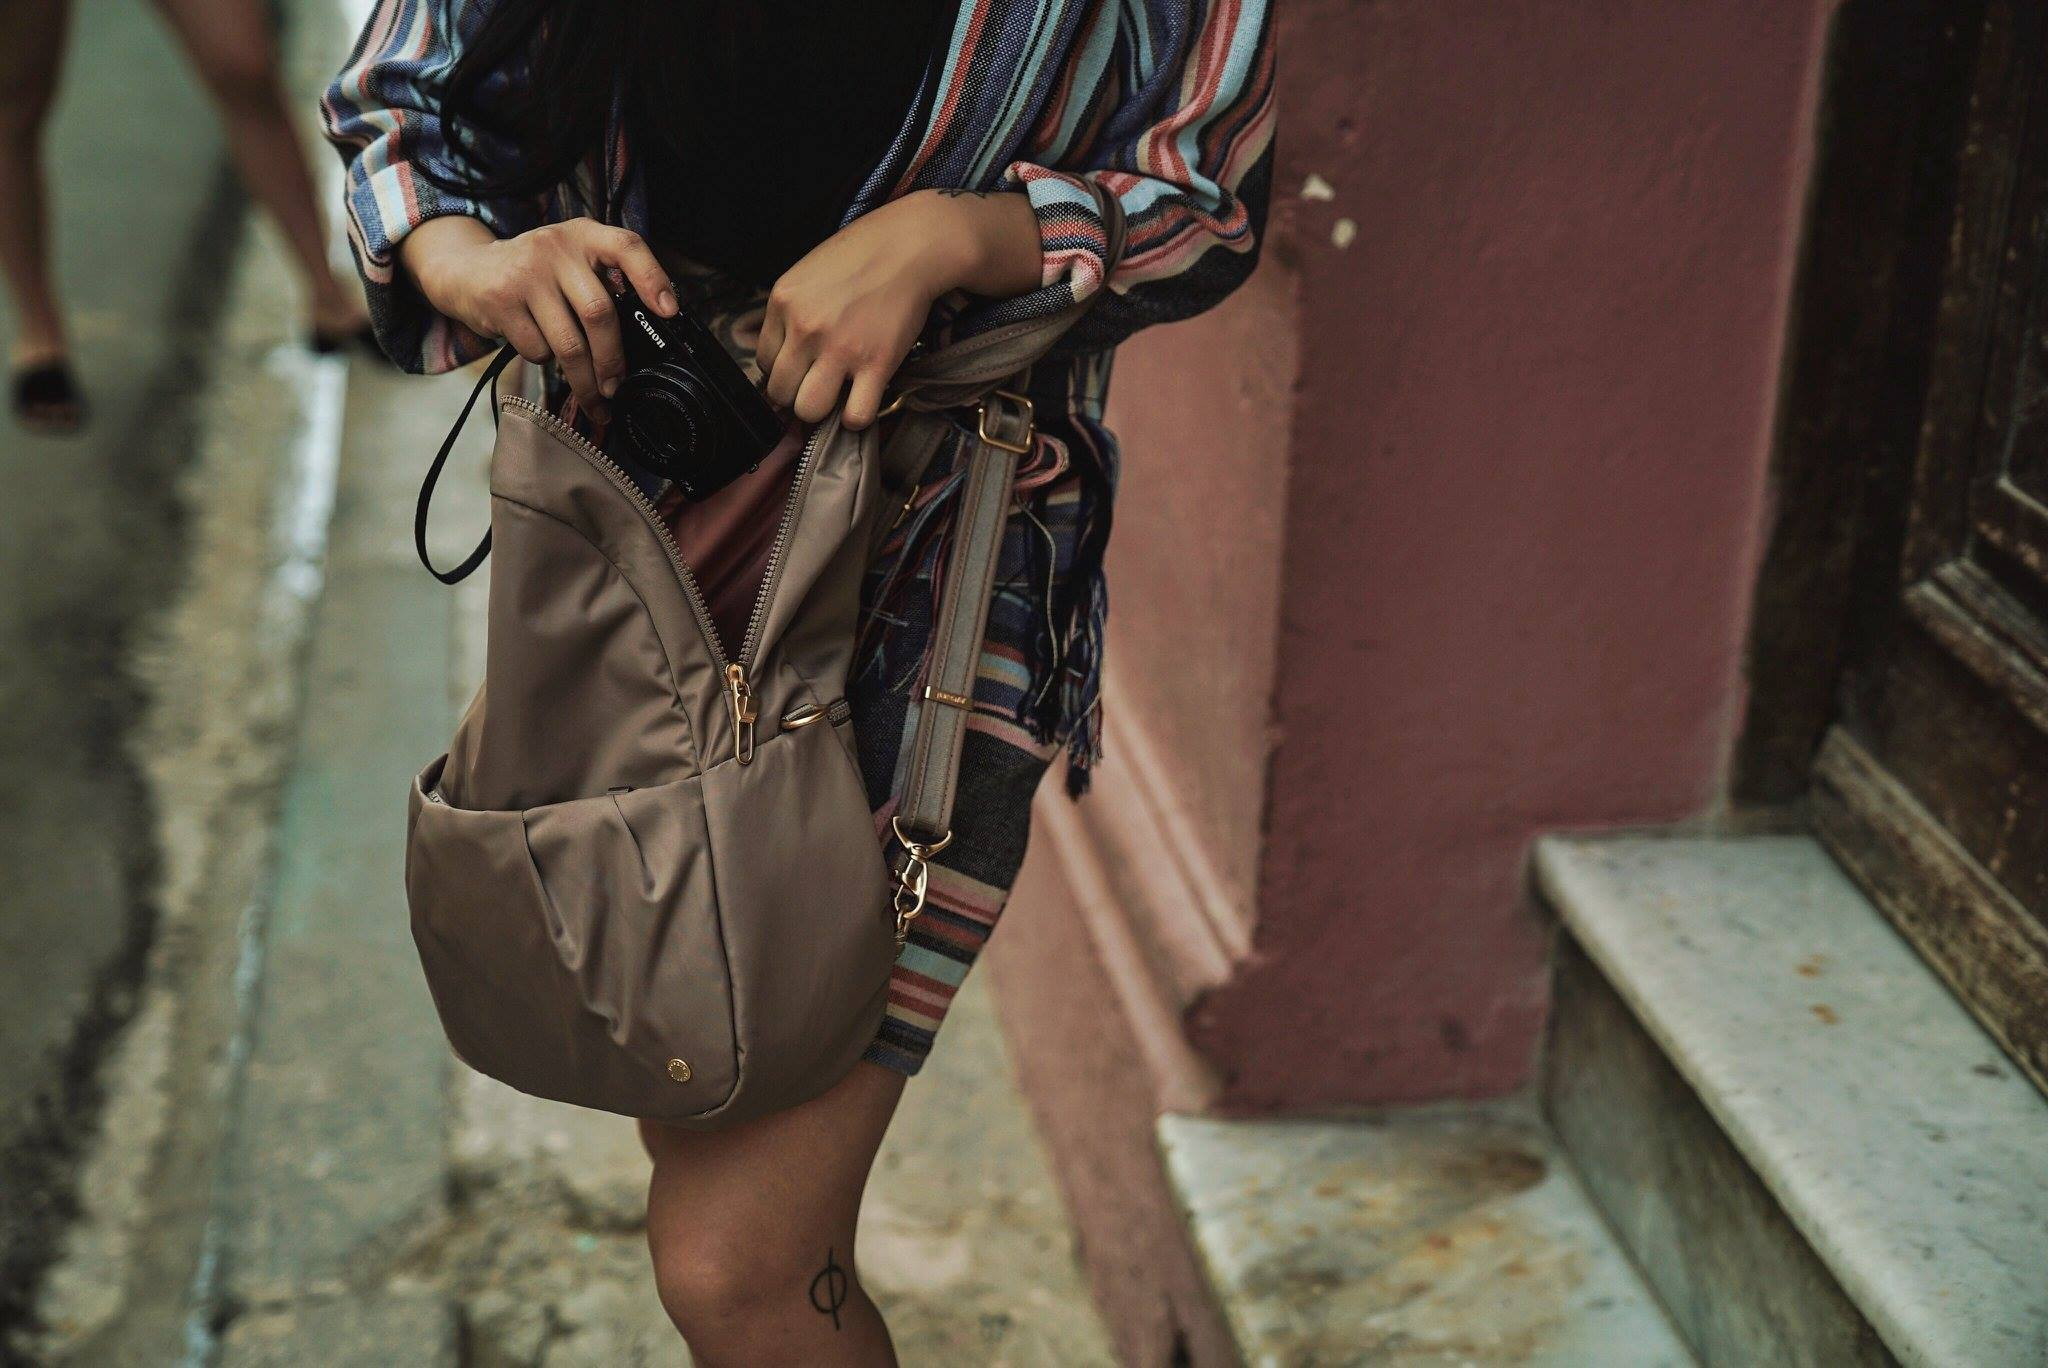 de802cfa3be6 Pacsafe® Citysafe CX Anti-Theft Convertible Backpack